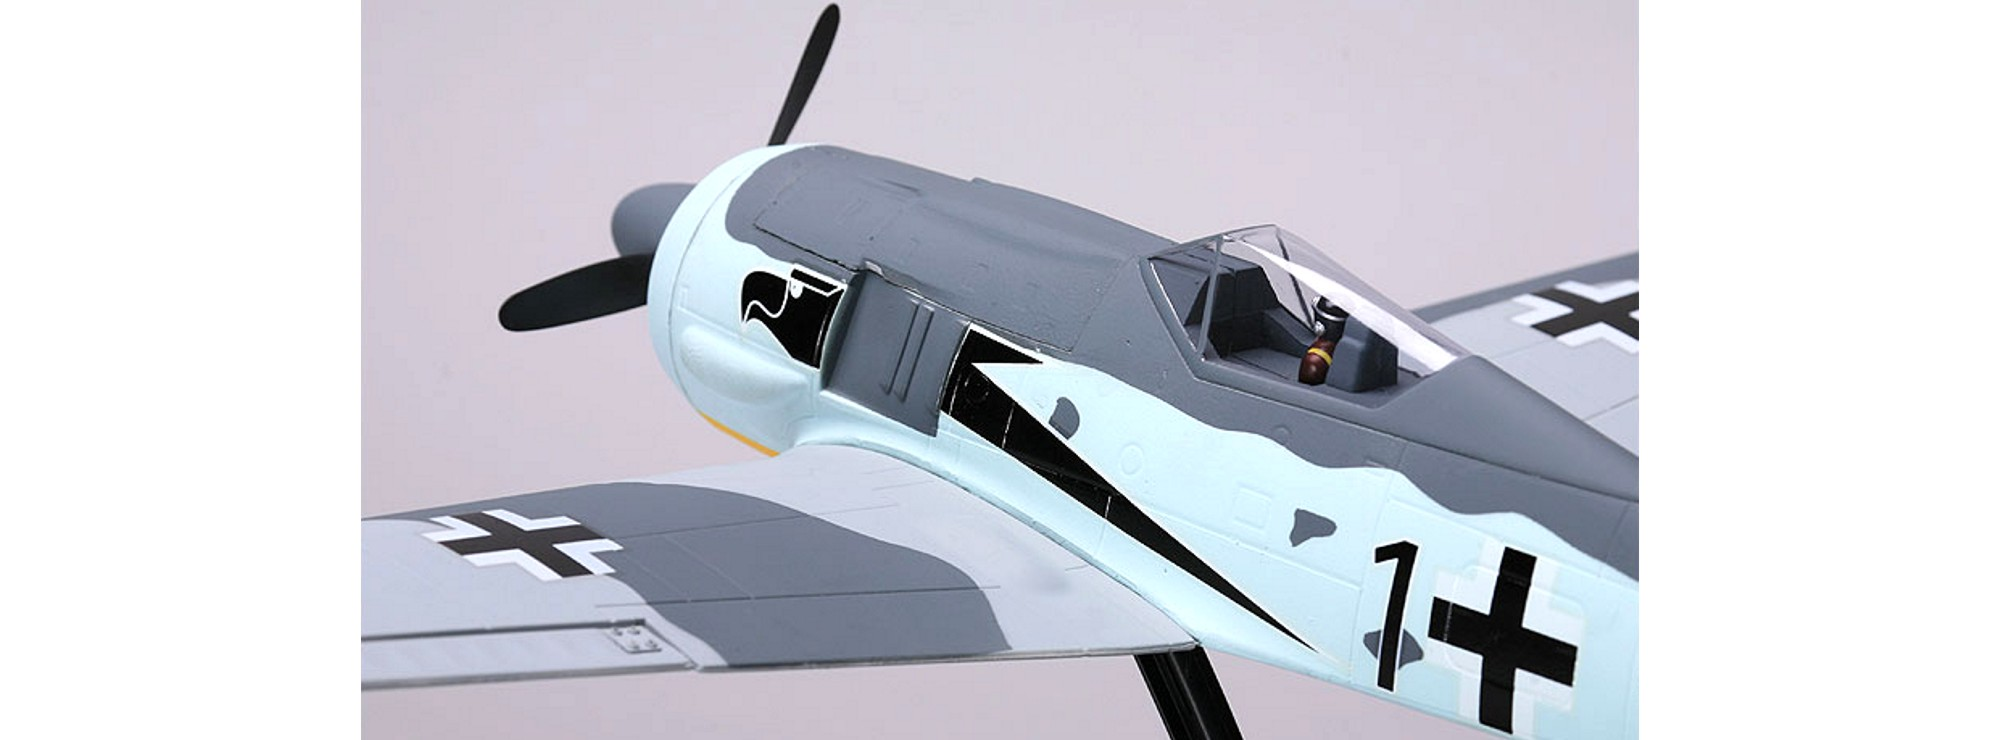 Ausverkauft Hype 025 1020 Focke Wulf 190 Arf Rc Flugzeug Fertigmodell